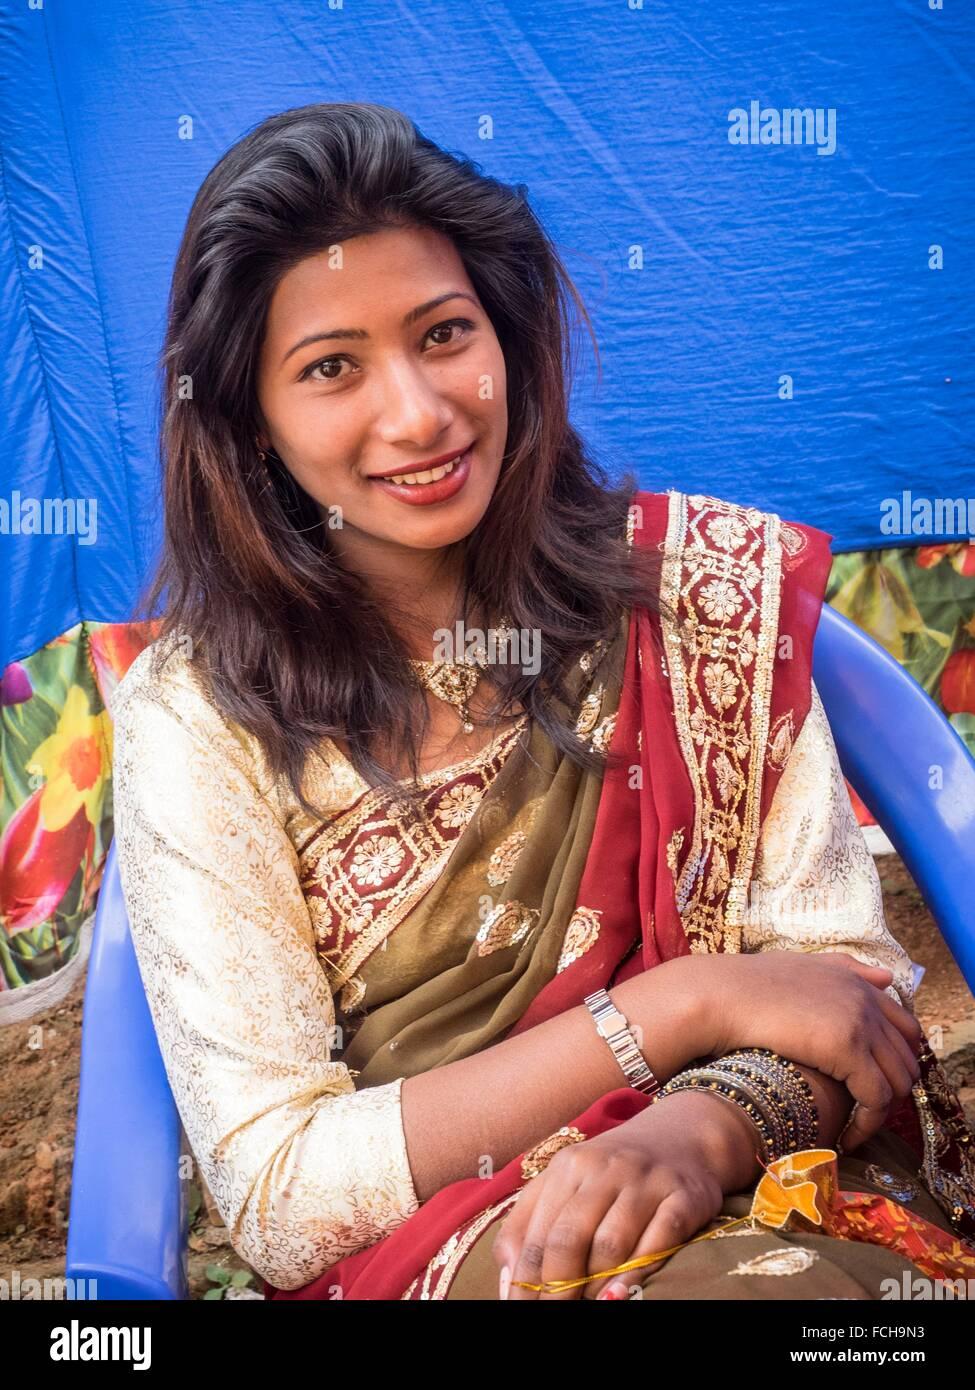 Matrimonio In Nepal : Matrimonio in nepal foto & immagine stock: 93808543 alamy